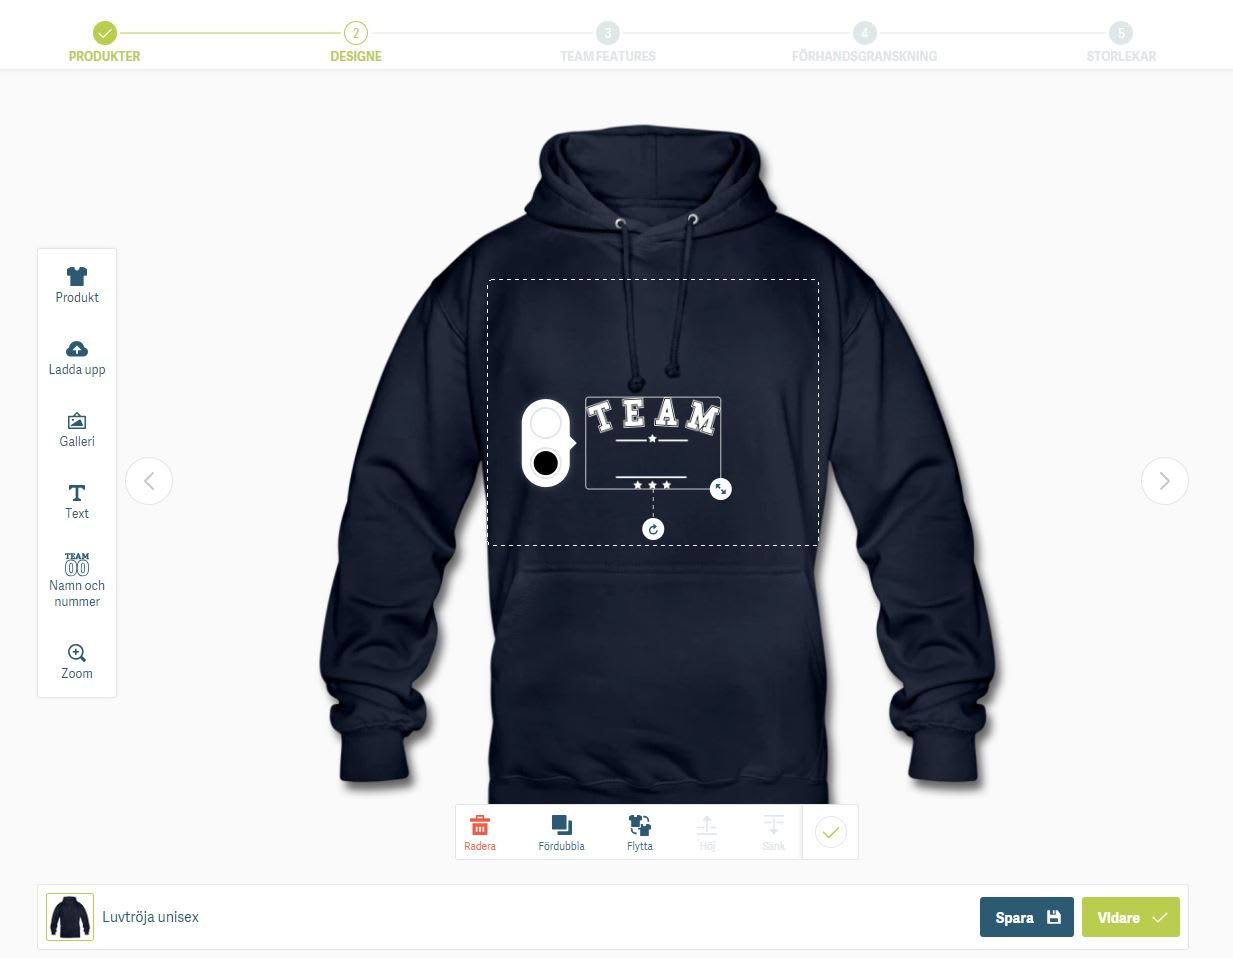 Tröja med tryck Designa din egen tröja Trycka tröjor